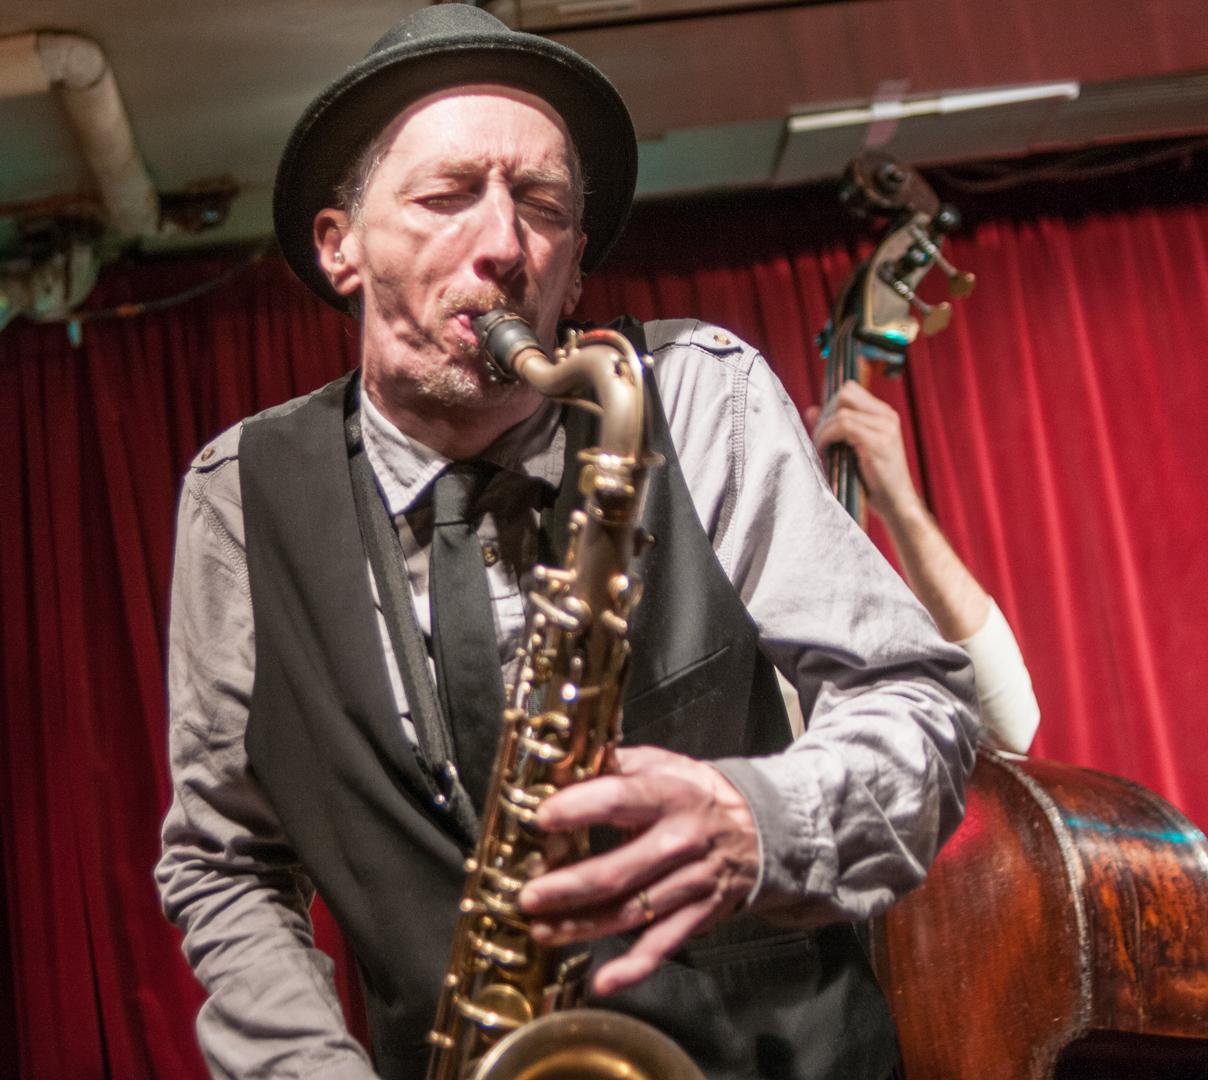 Ellery Eskelin with the David Liebman Quintet at the Cornelia Street Cafe